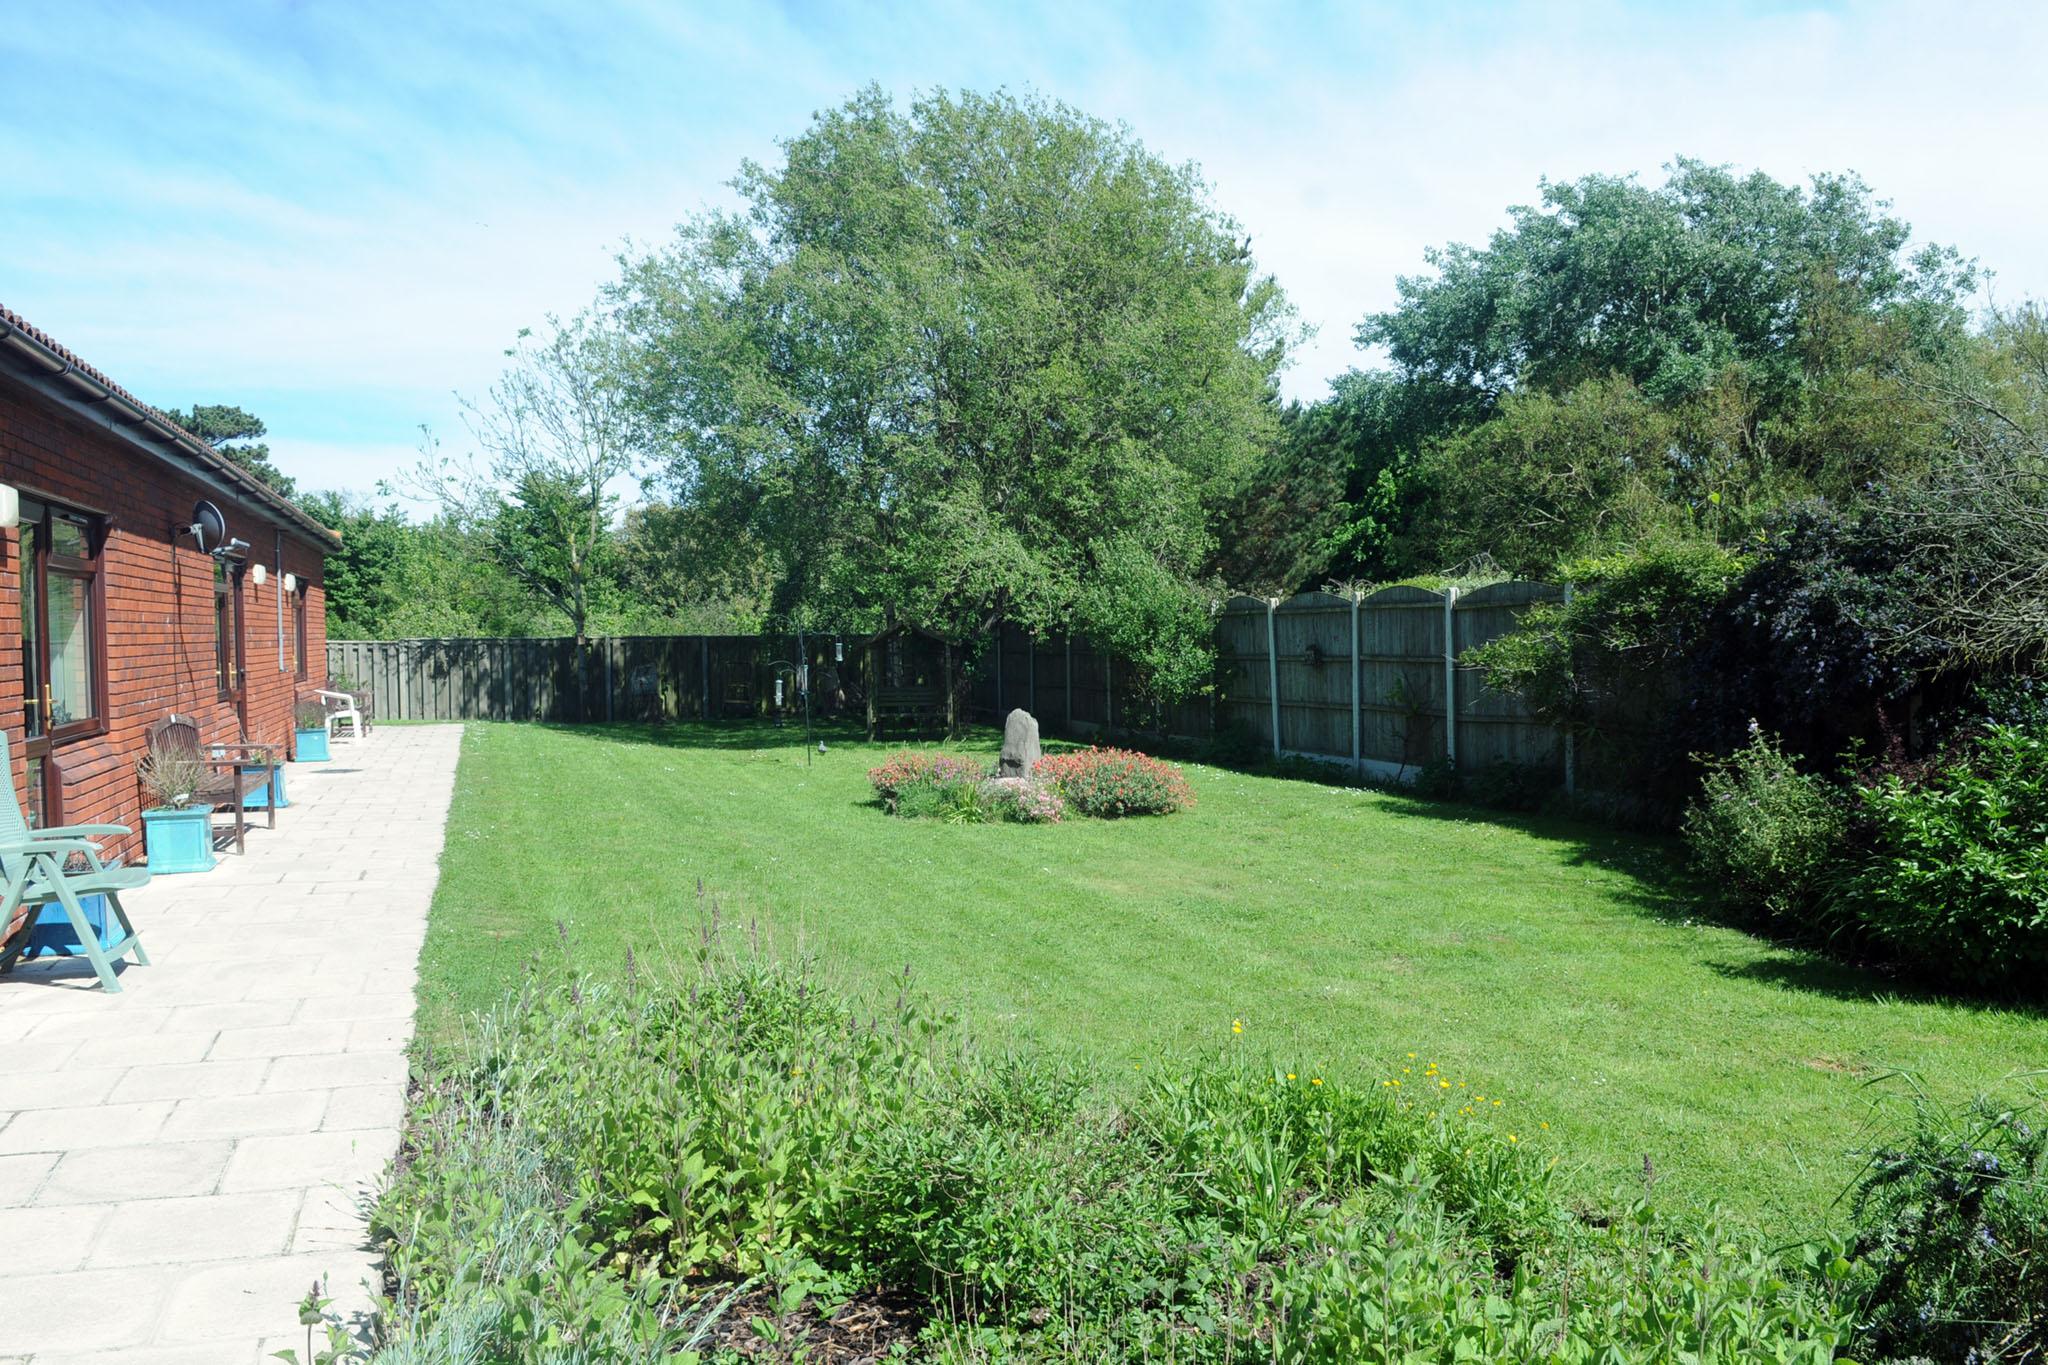 Manorfield Residential Home Garden Area